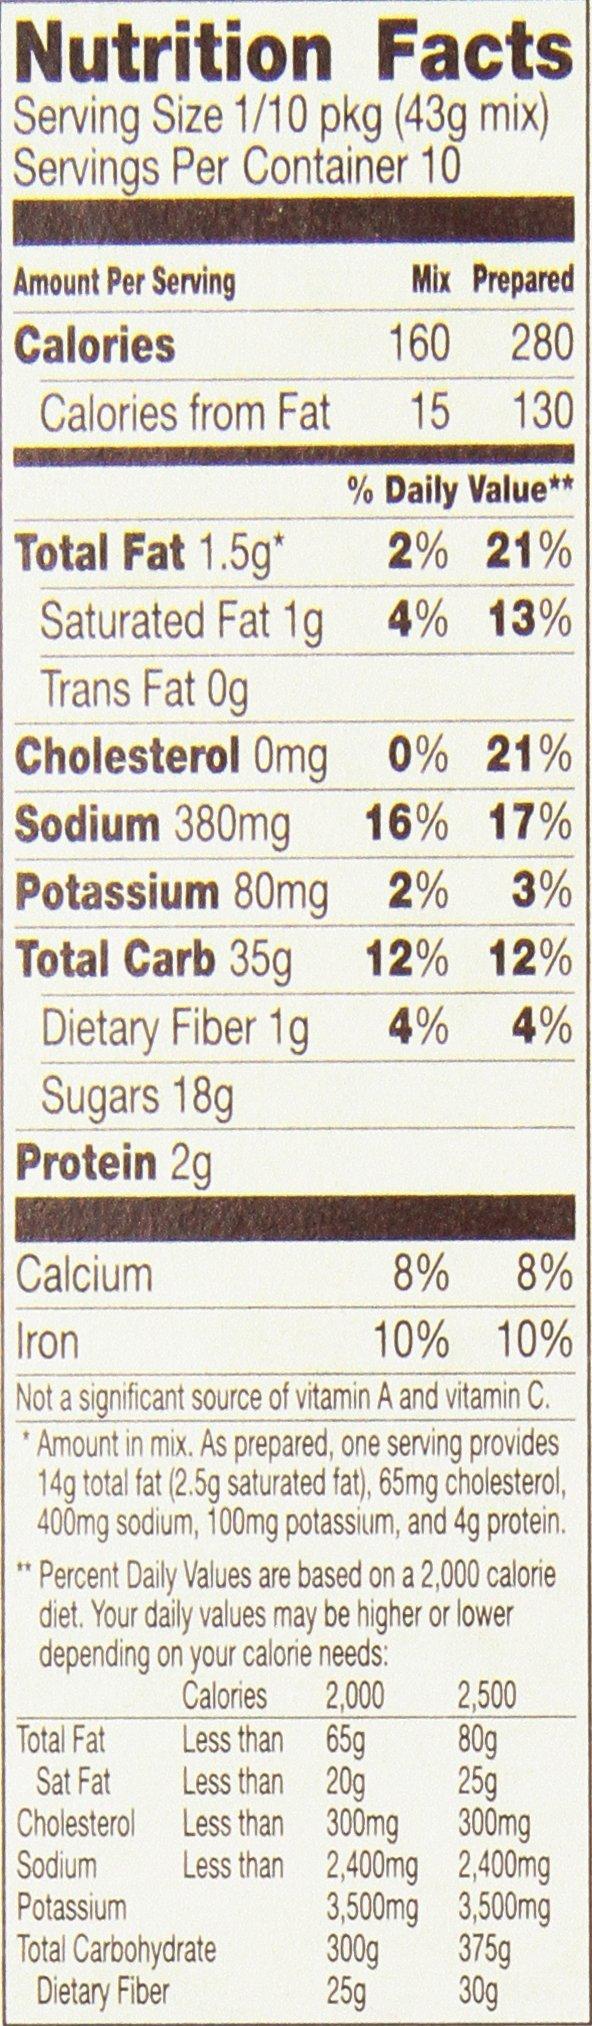 Betty Crocker Super Moist Cake Mix Dark Chocolate 15.25 oz Box (pack of 6) by Betty Crocker (Image #2)